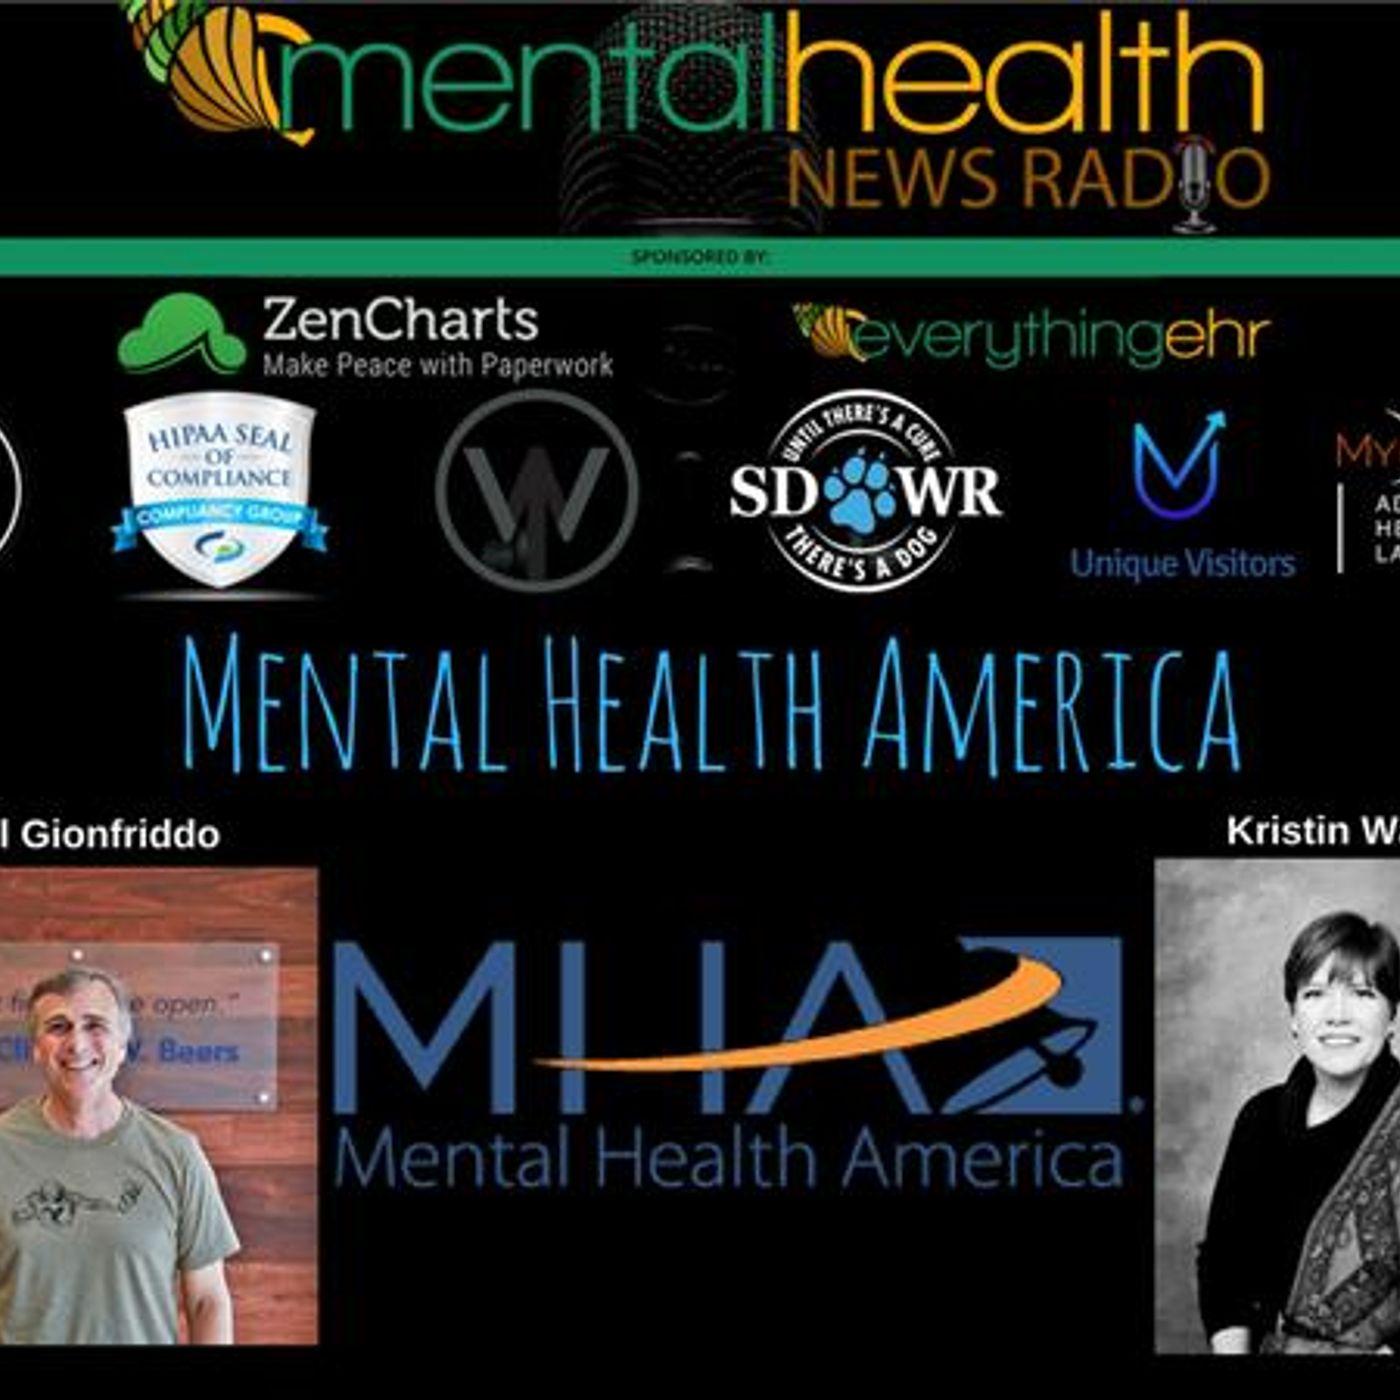 Mental Health News Radio - Mental Health America CEO Paul Gionfriddo on Mental Health News Radio